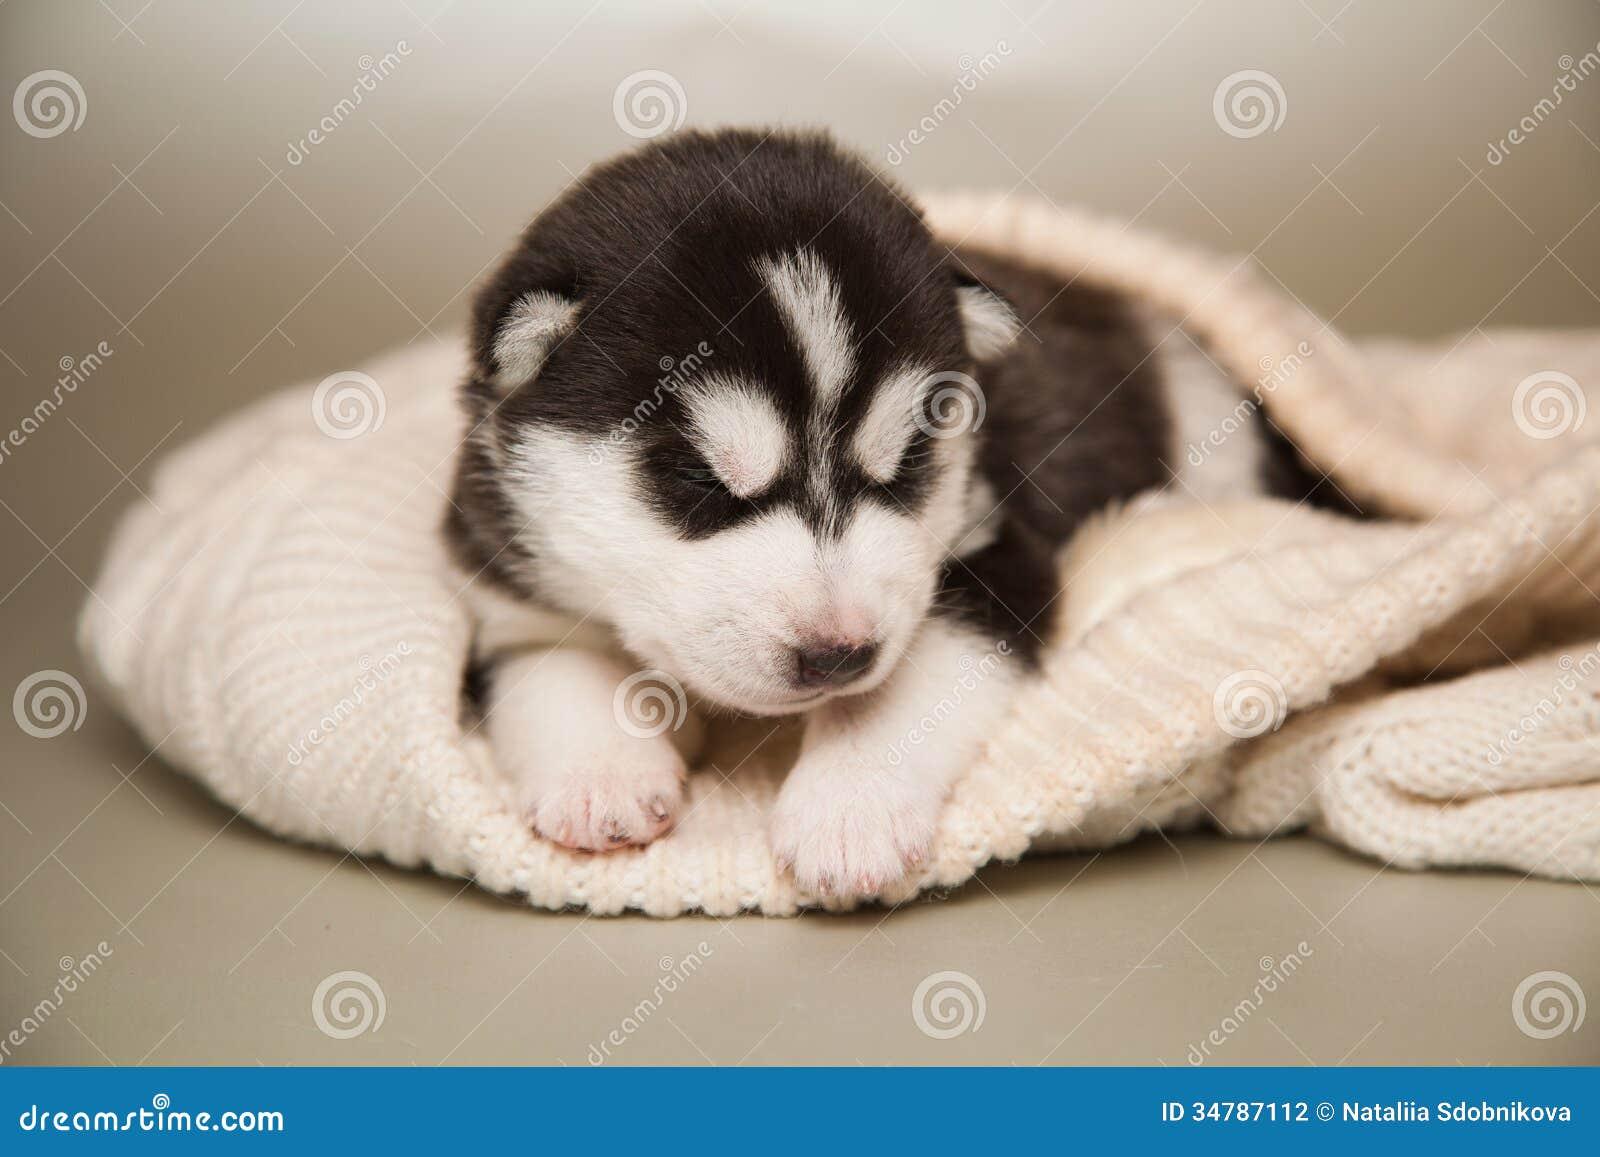 Newborn Puppy Stock Photo Image Of Adorable Pedigree